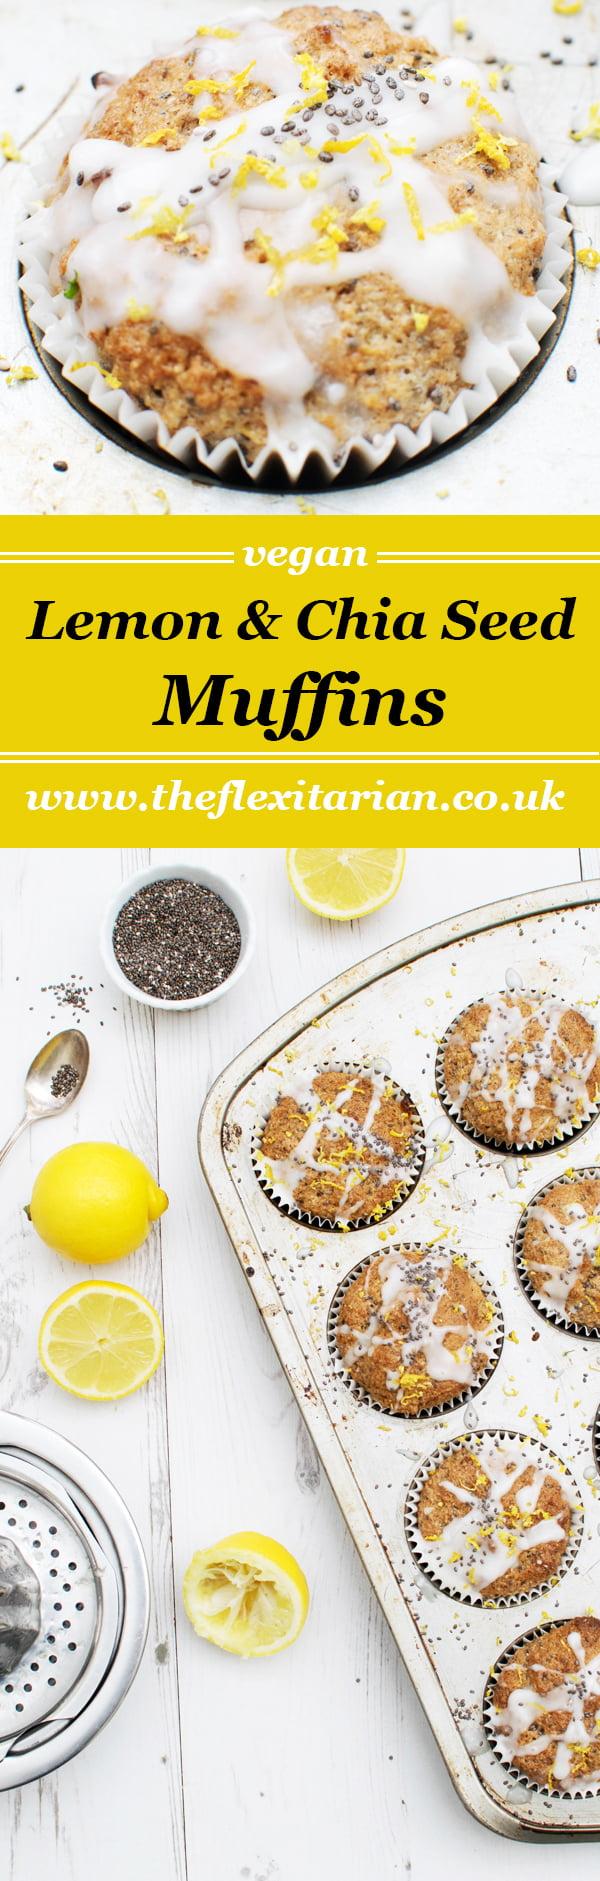 Lemon & Chia Seed Muffins [vegan] by The Flexitarian